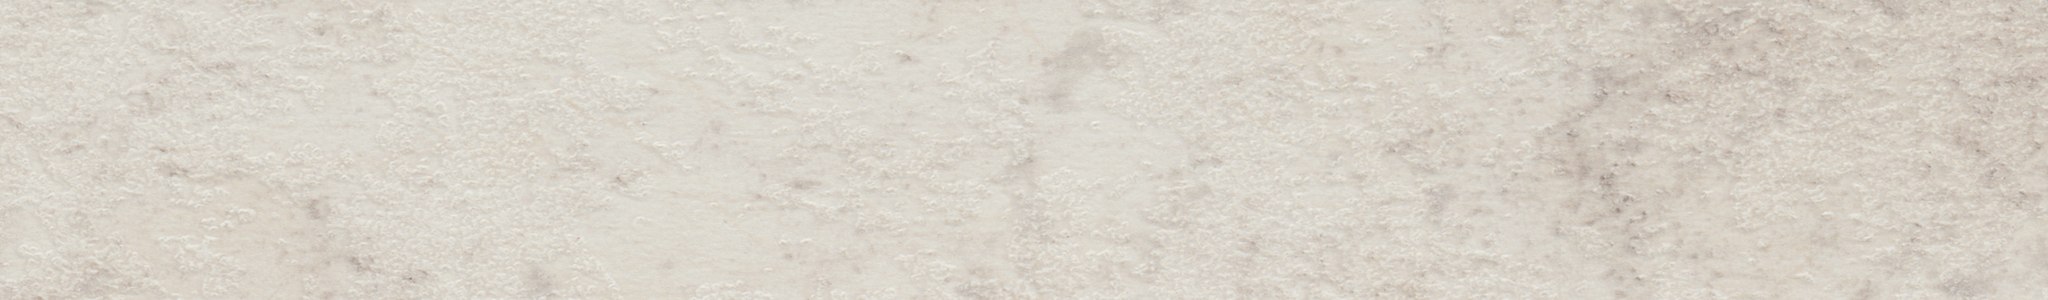 HD 292281 ABS hrana urbanstone clay softmat